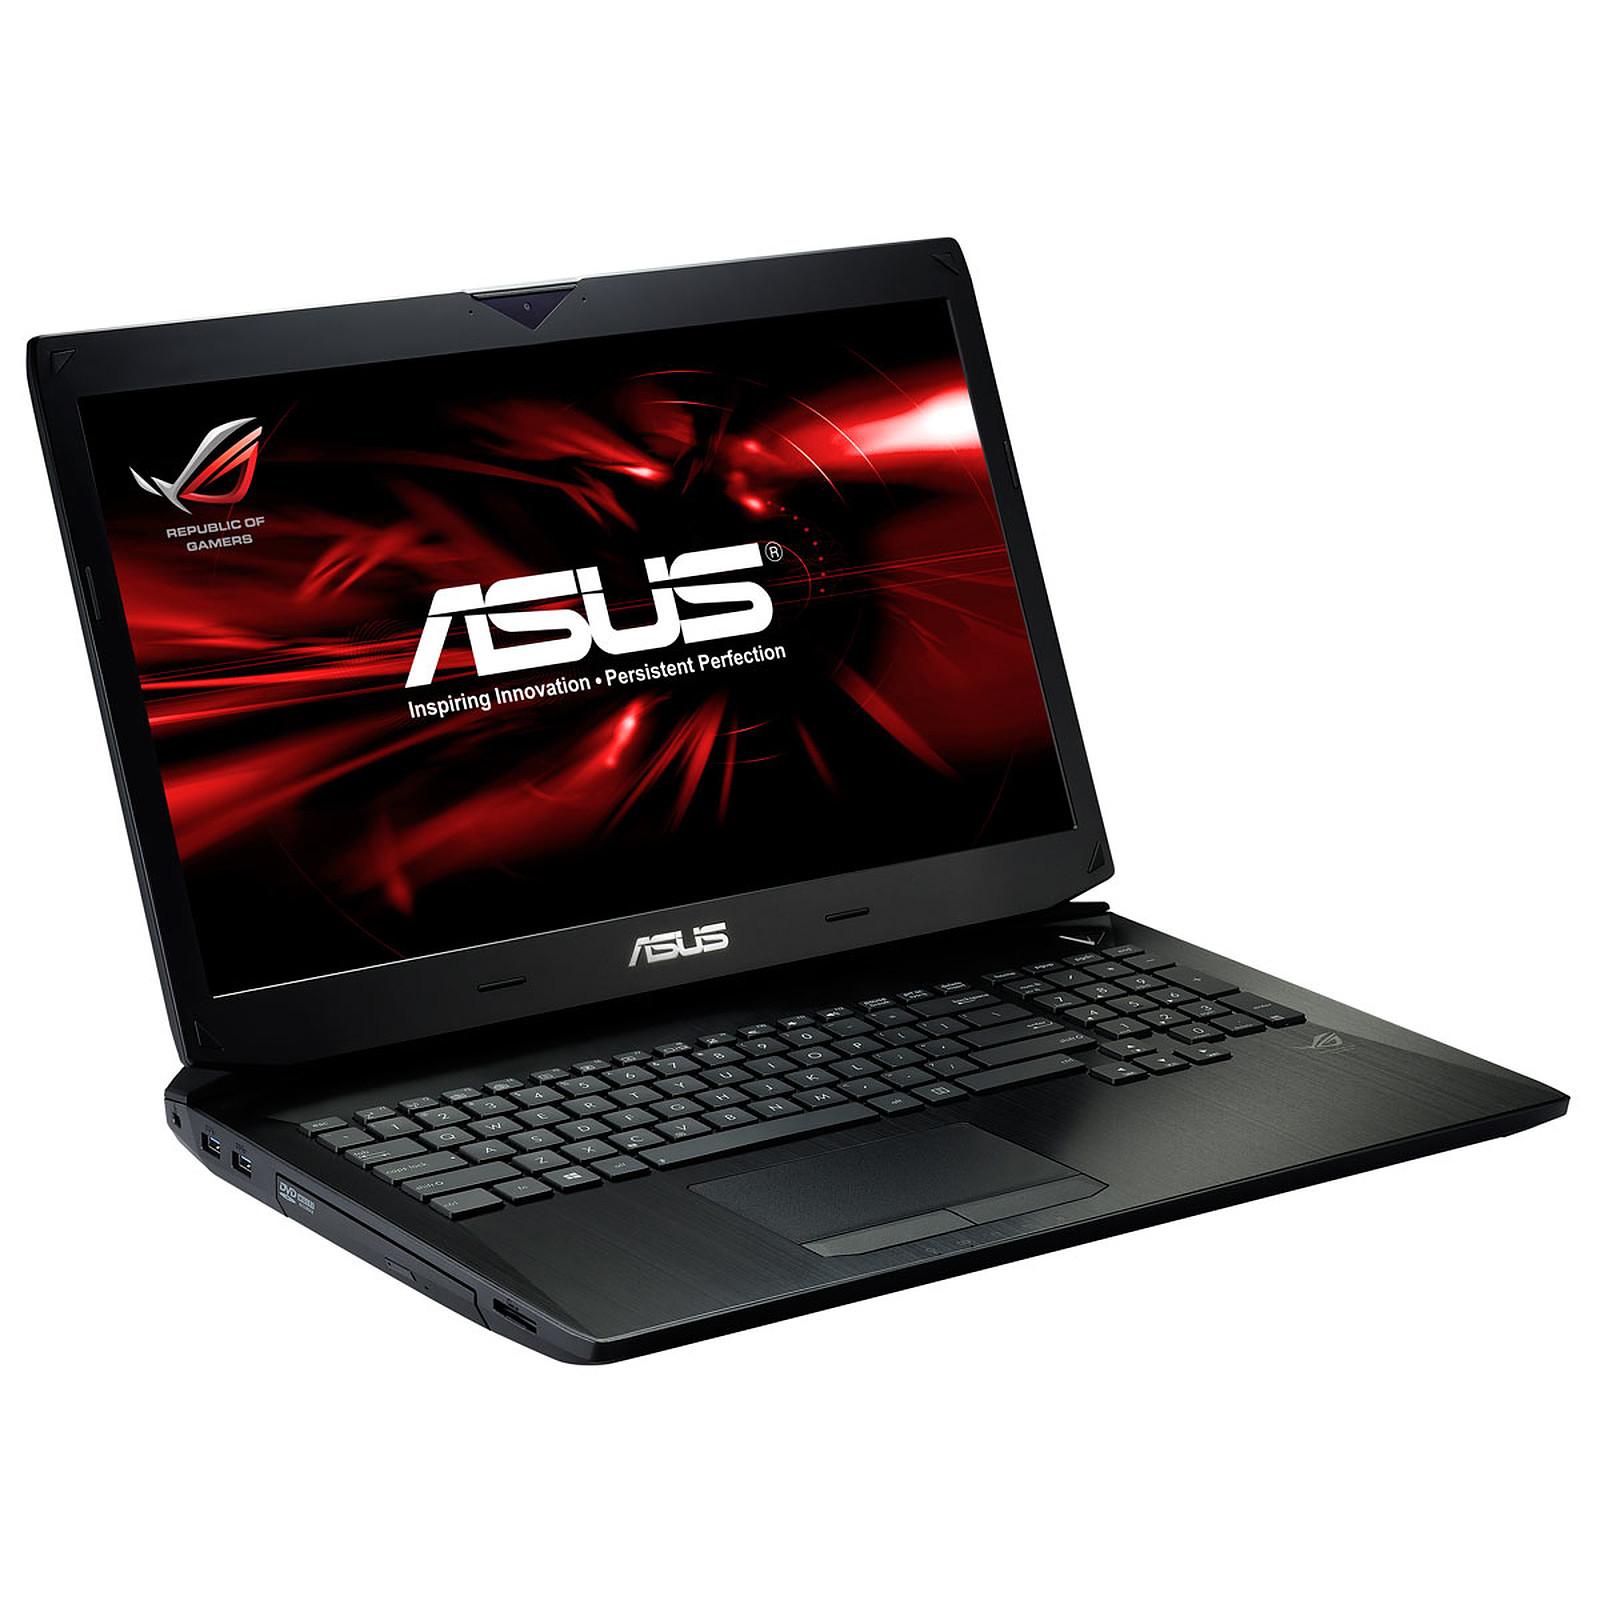 ASUS G750JX-T4045H